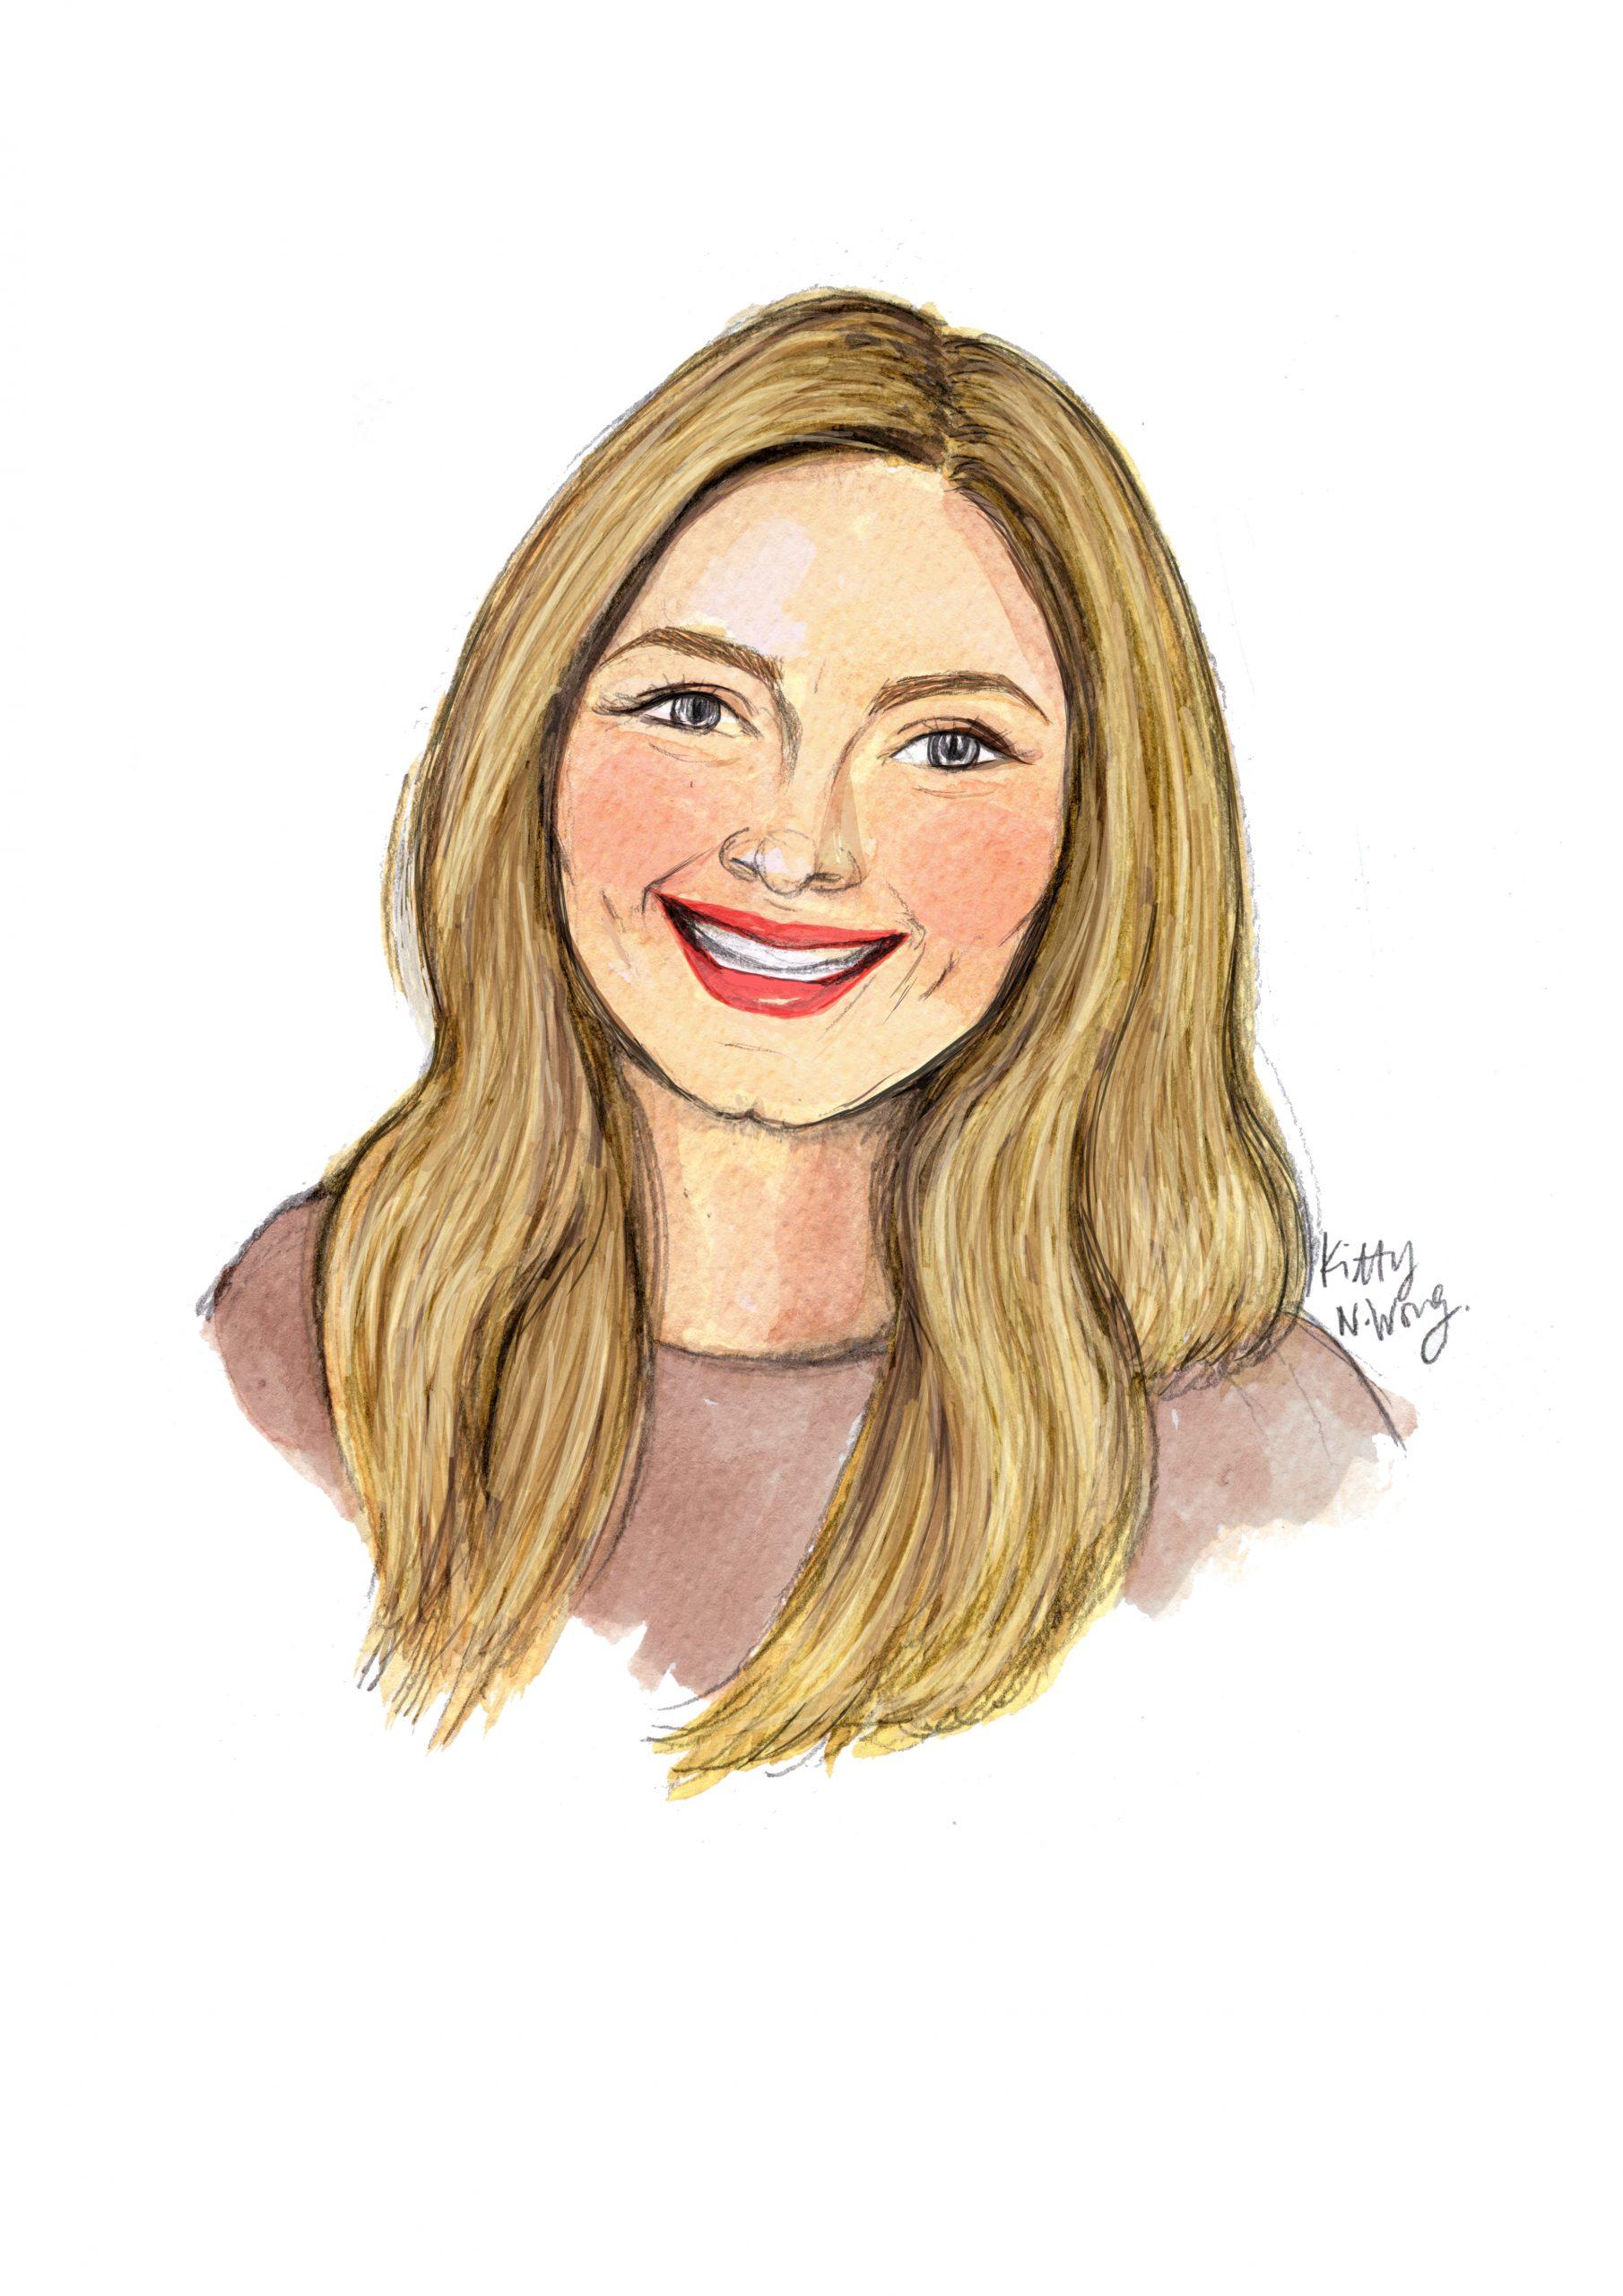 Carla Thomas, Illustrated by Kitty Wong